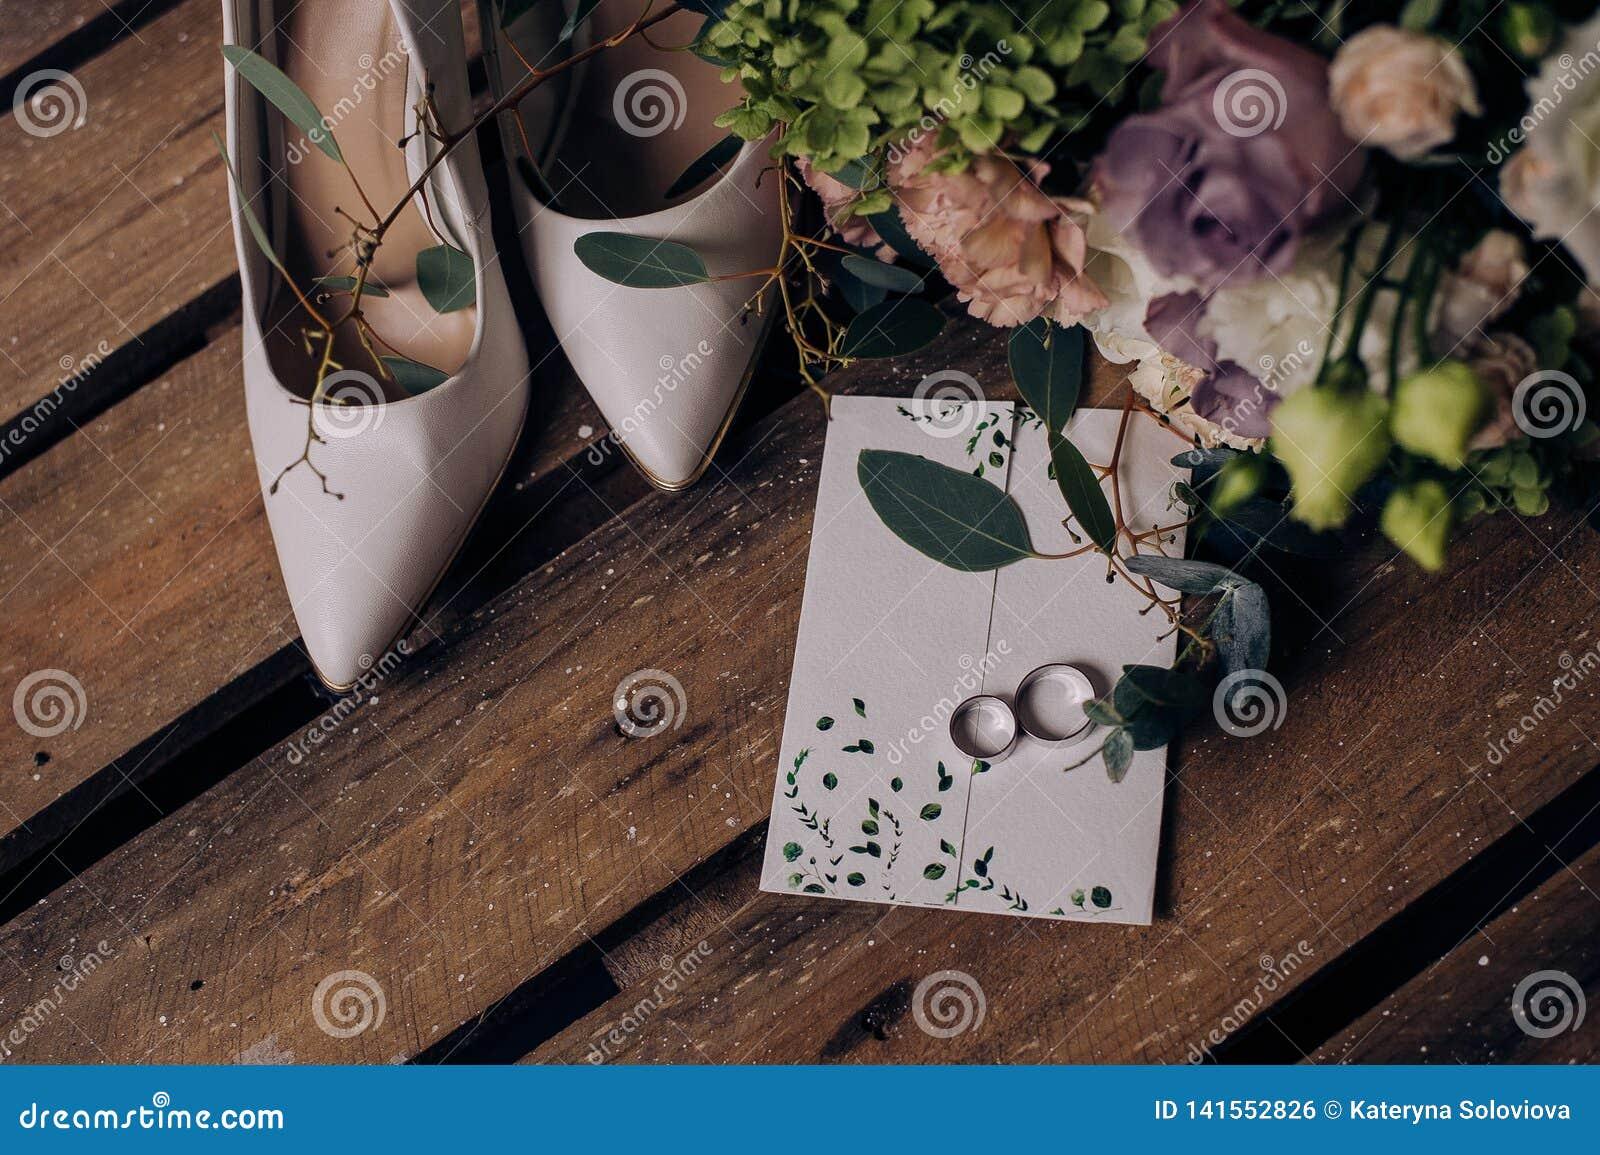 Wedding accessory bride. Stylish beige shoes, earrings, gold rings, flowers, garter on wooden background